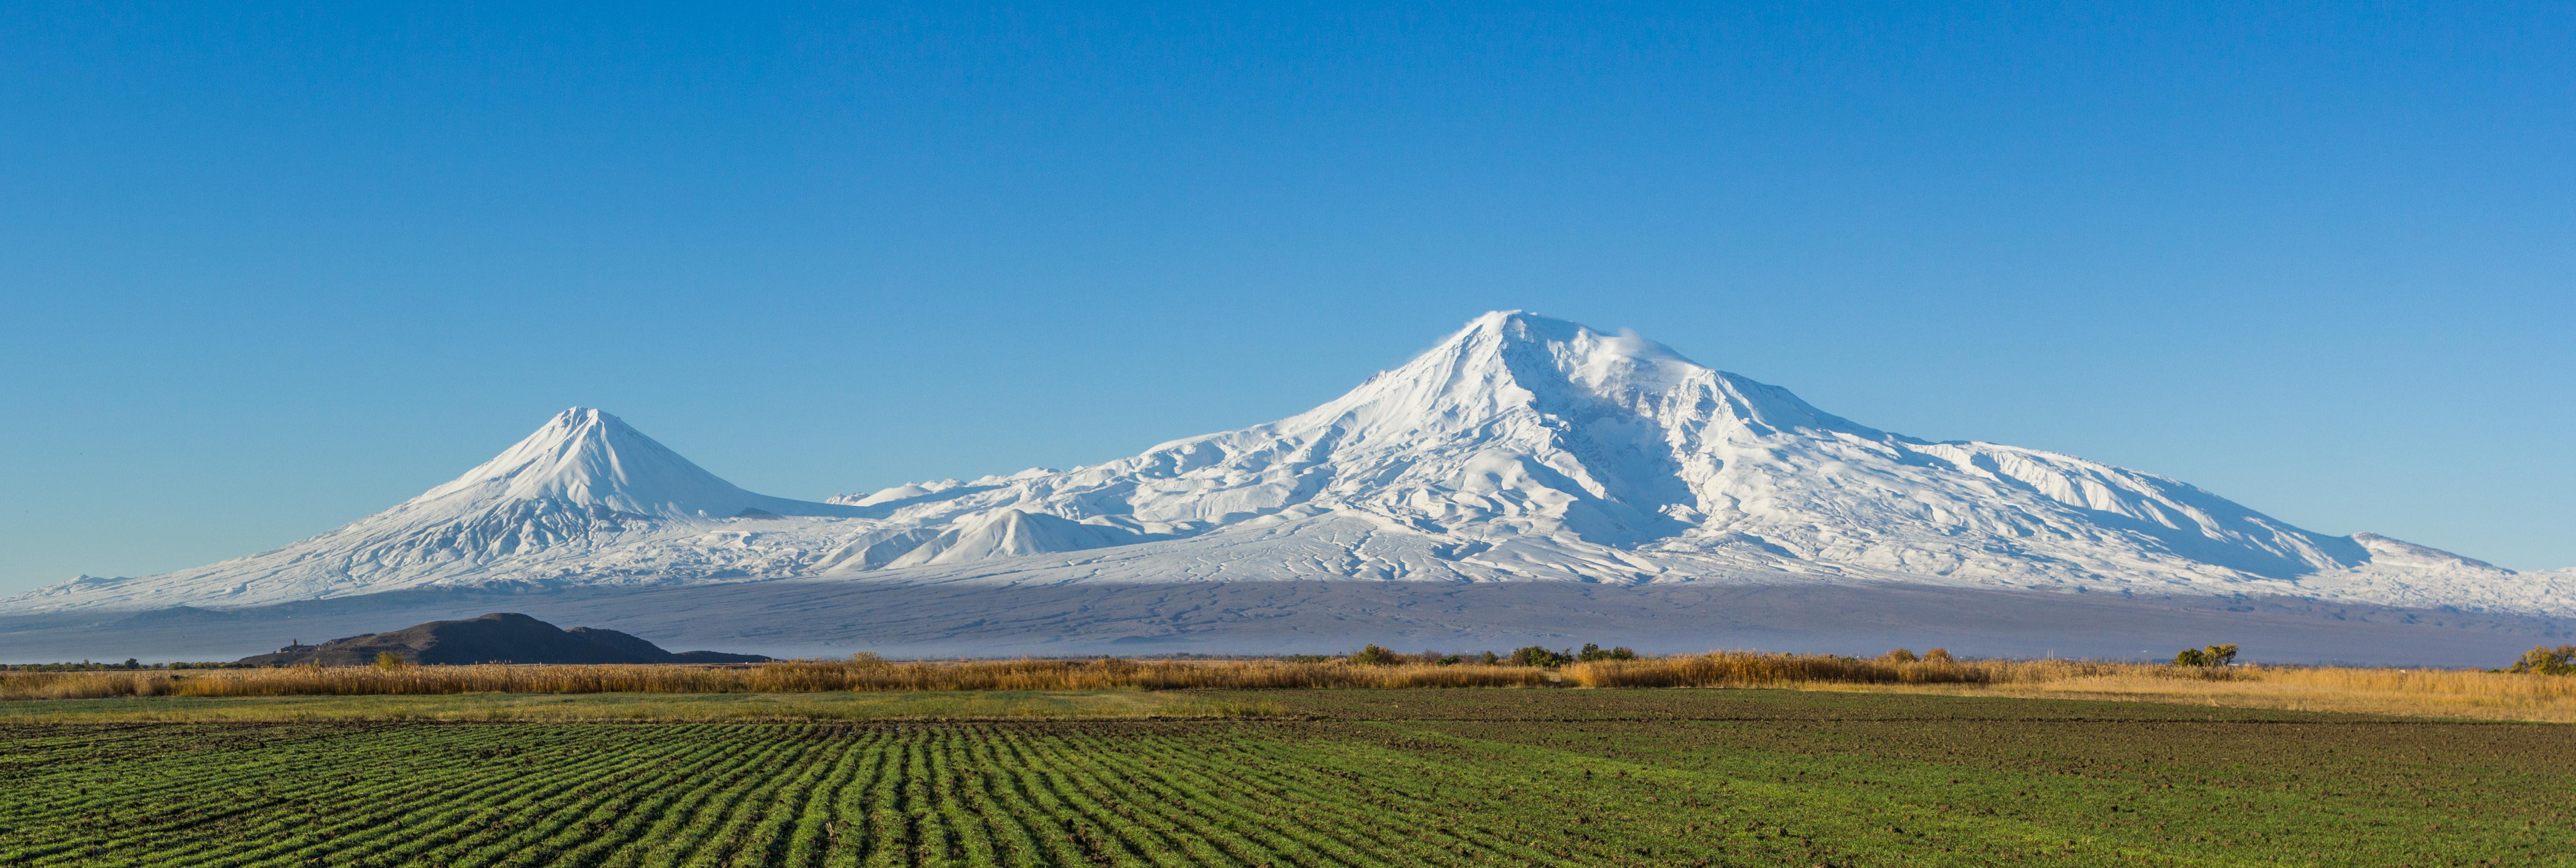 Mount_Ararat_and_the_Araratian_plain_(cropped)